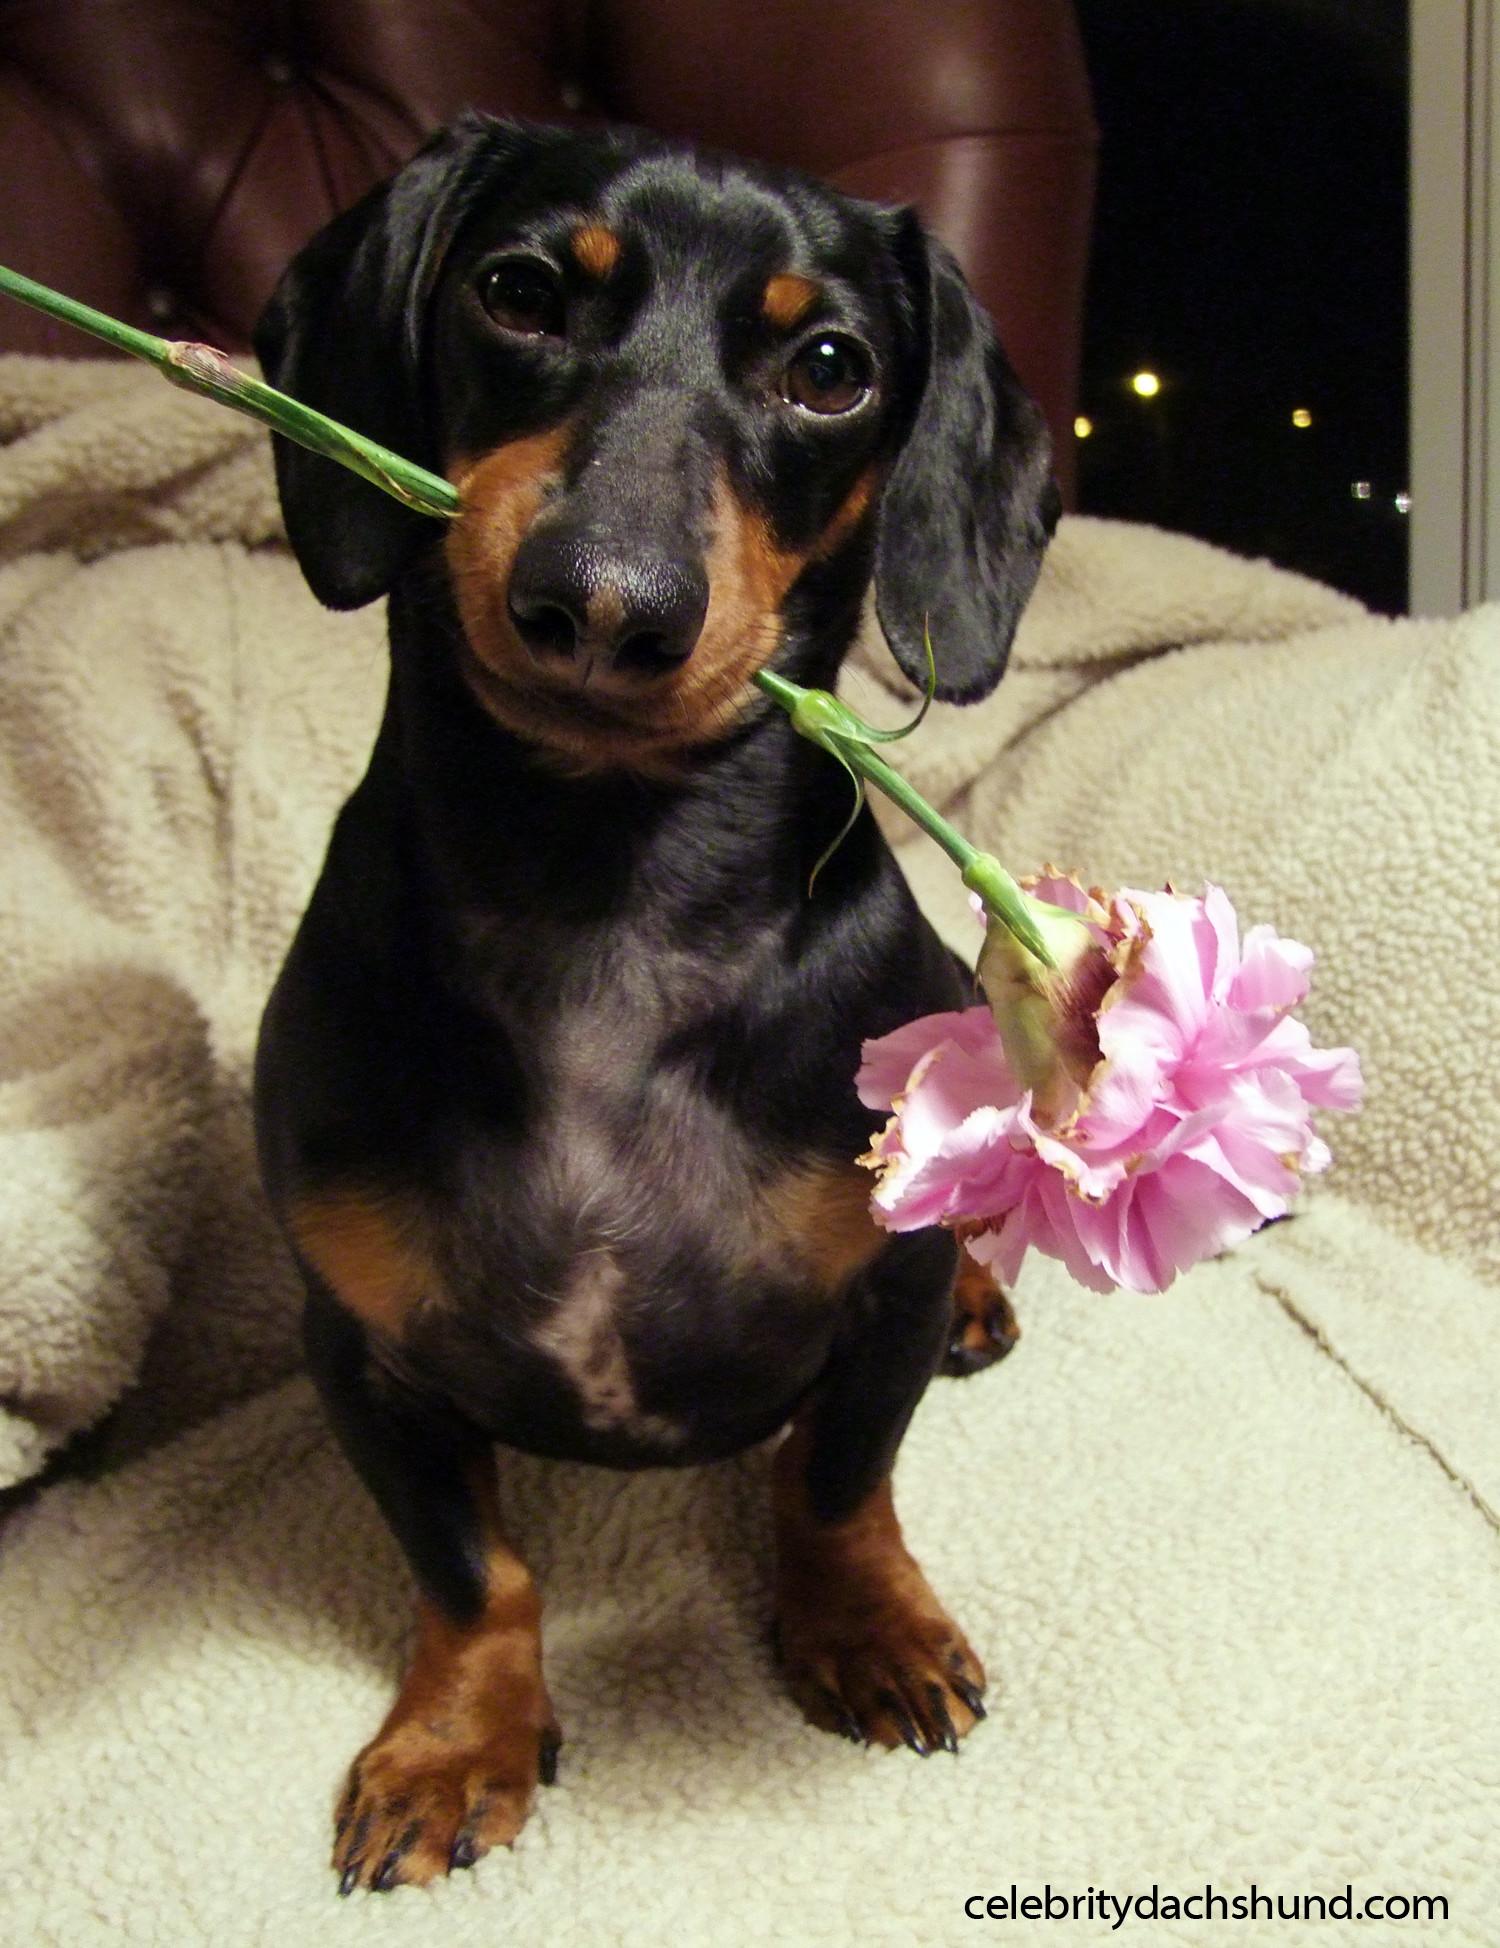 A Dachshund Valentine's Day – Crusoe the Celebrity Dachshund